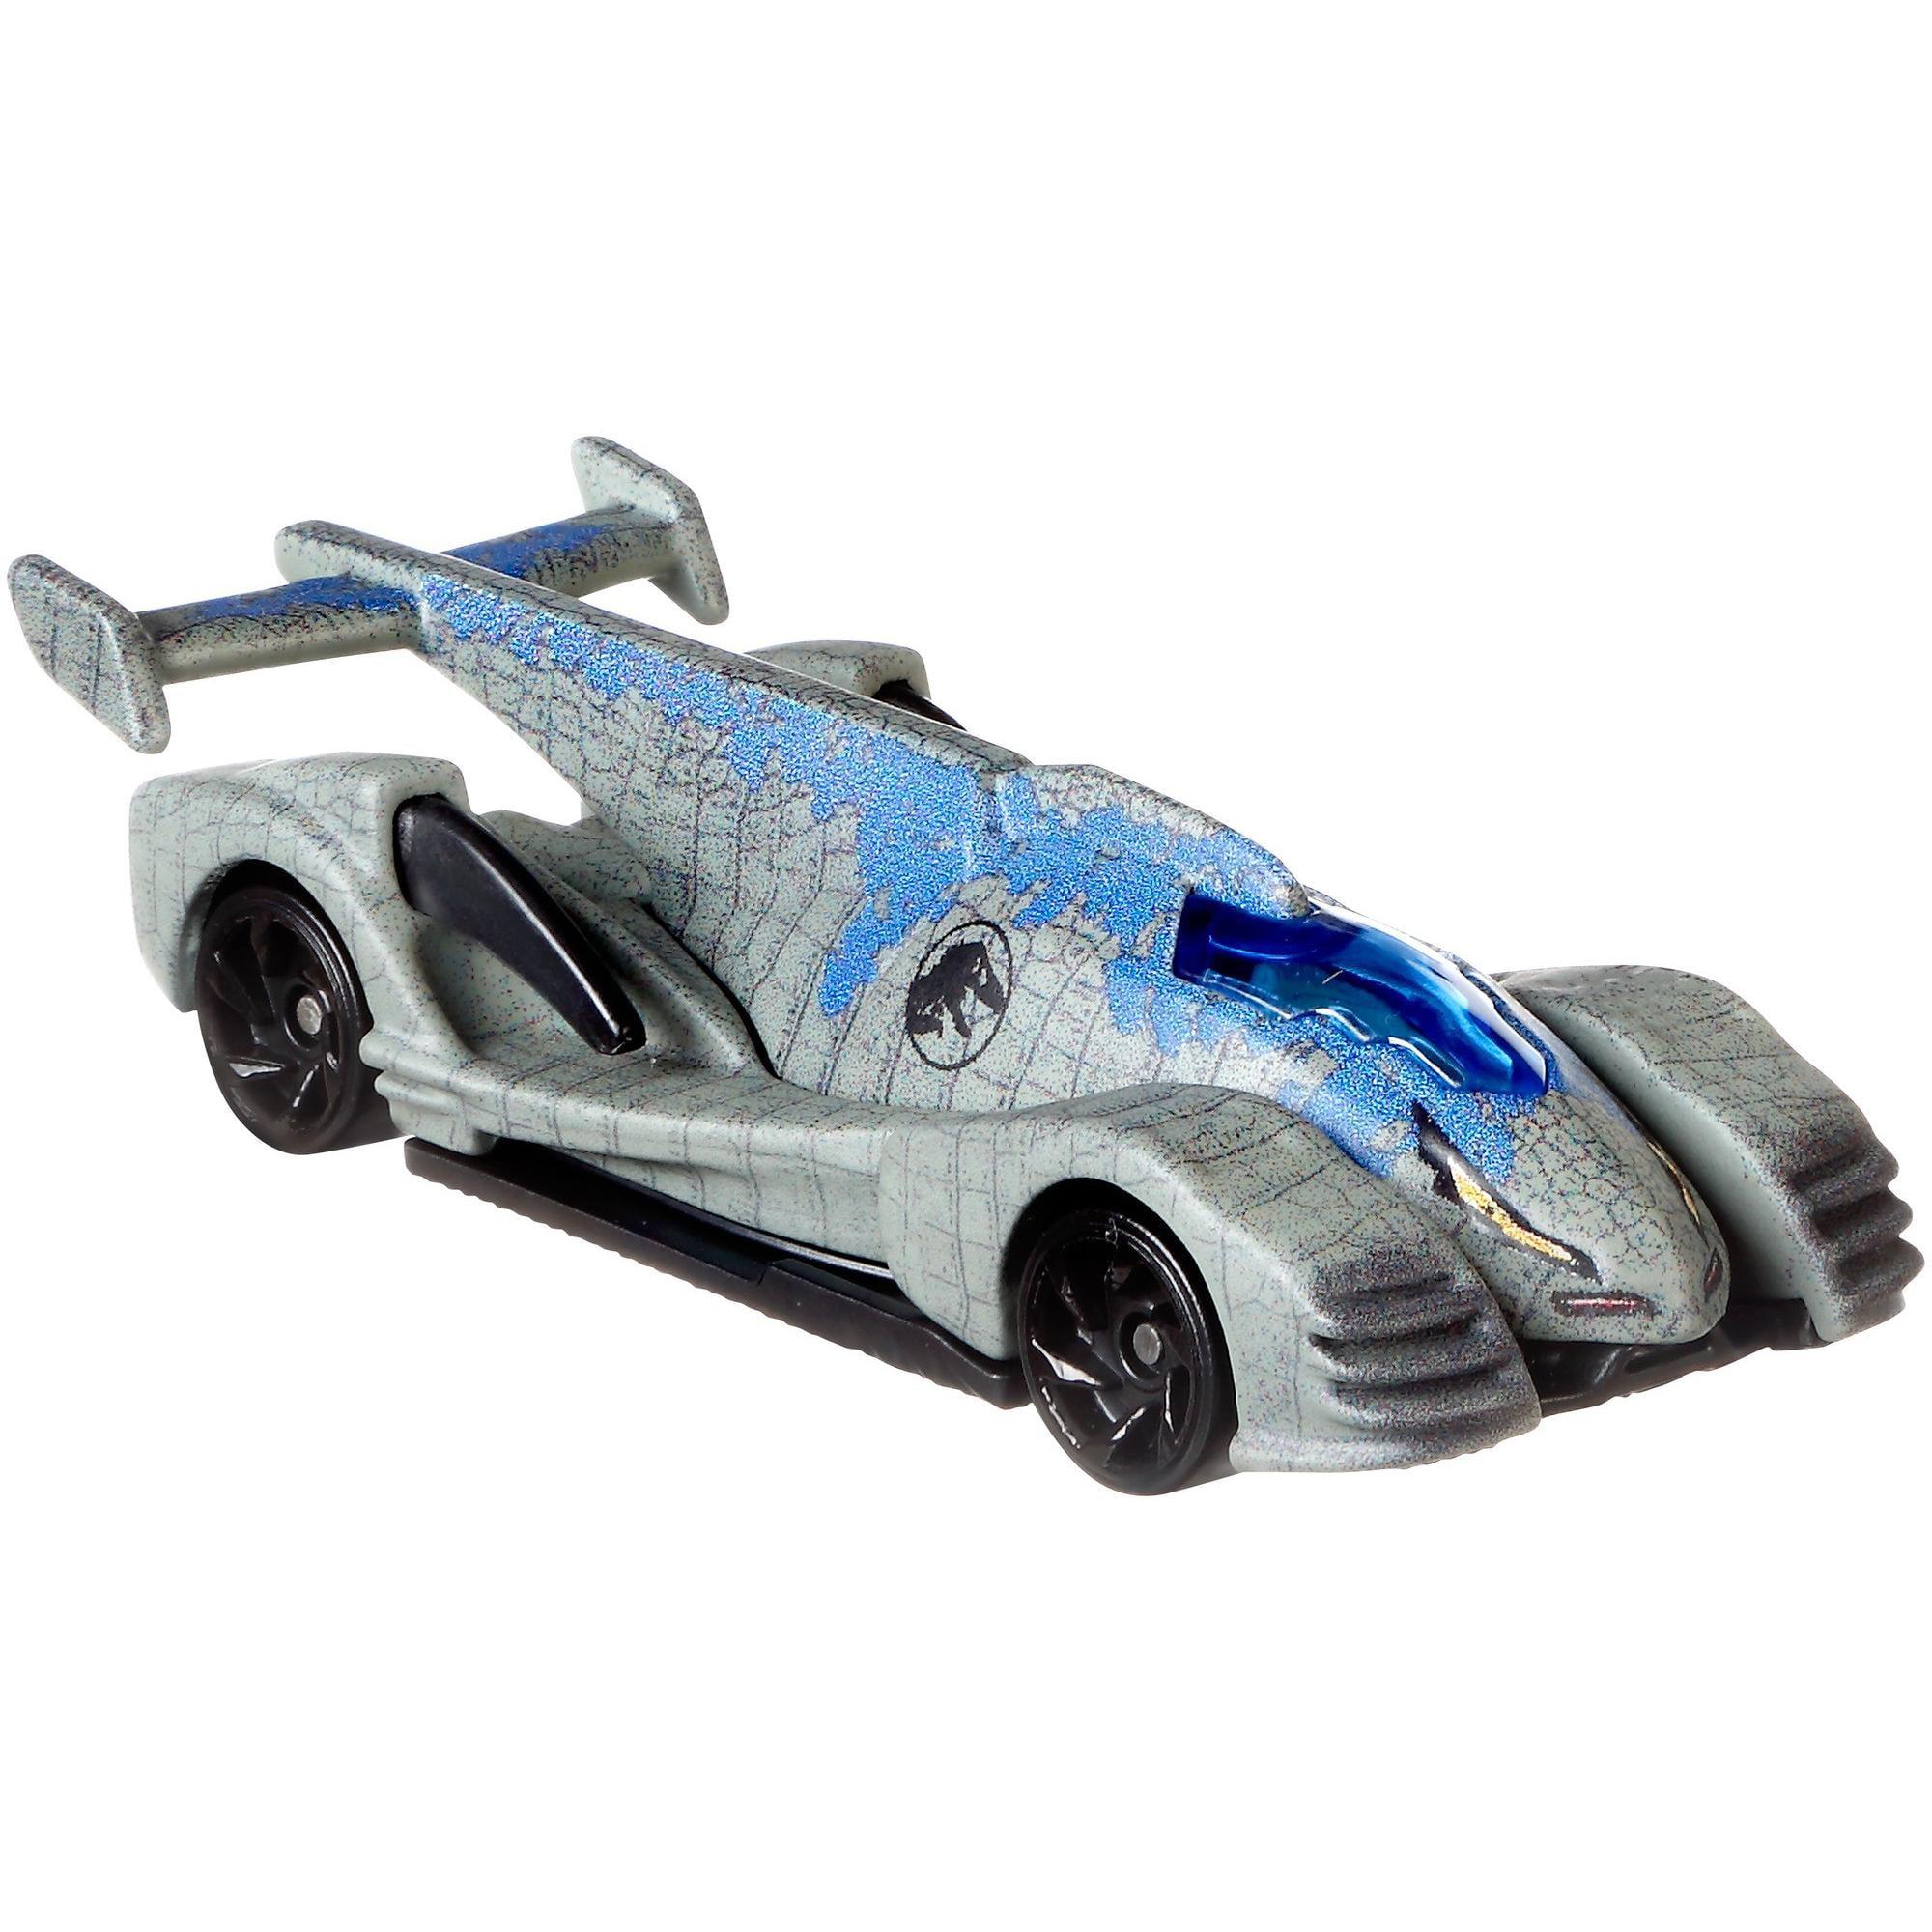 Hot Wheels Jurassic World Velociraptor Blue, Vehicle by Mattel